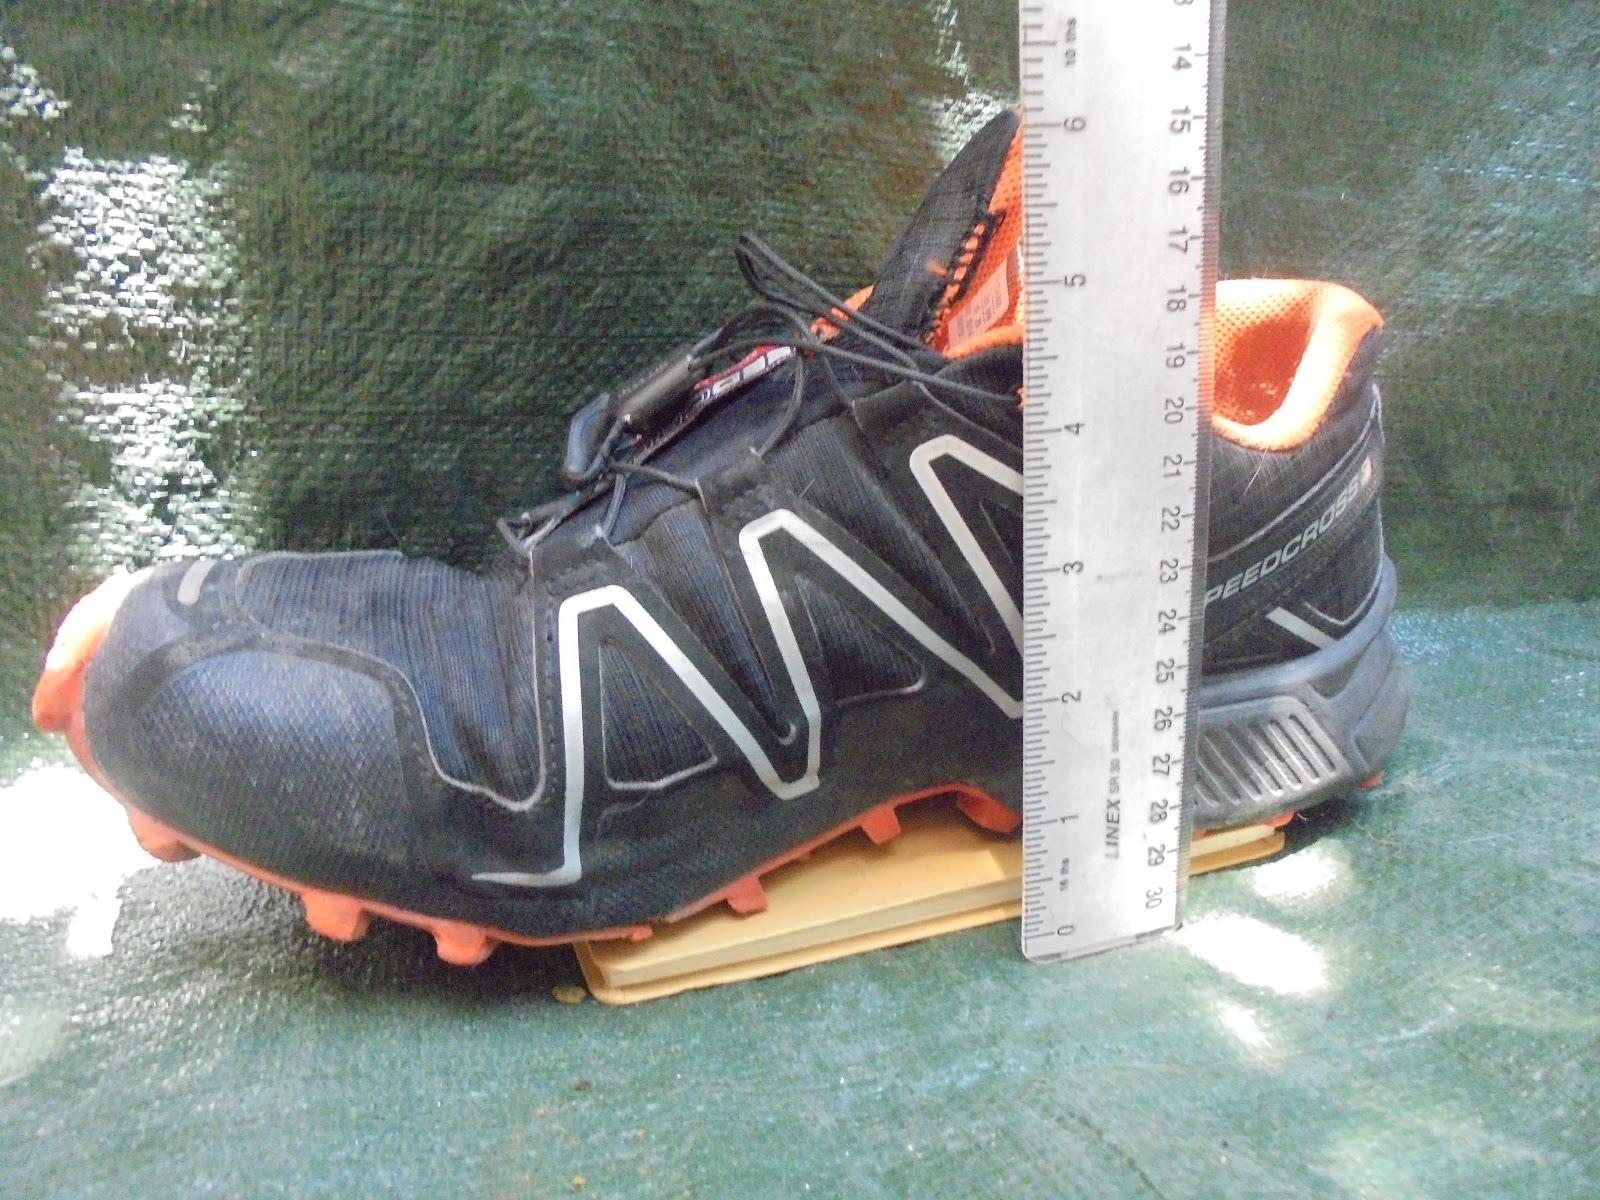 210145a166 Ένα Trekking παπούτσι στις 4